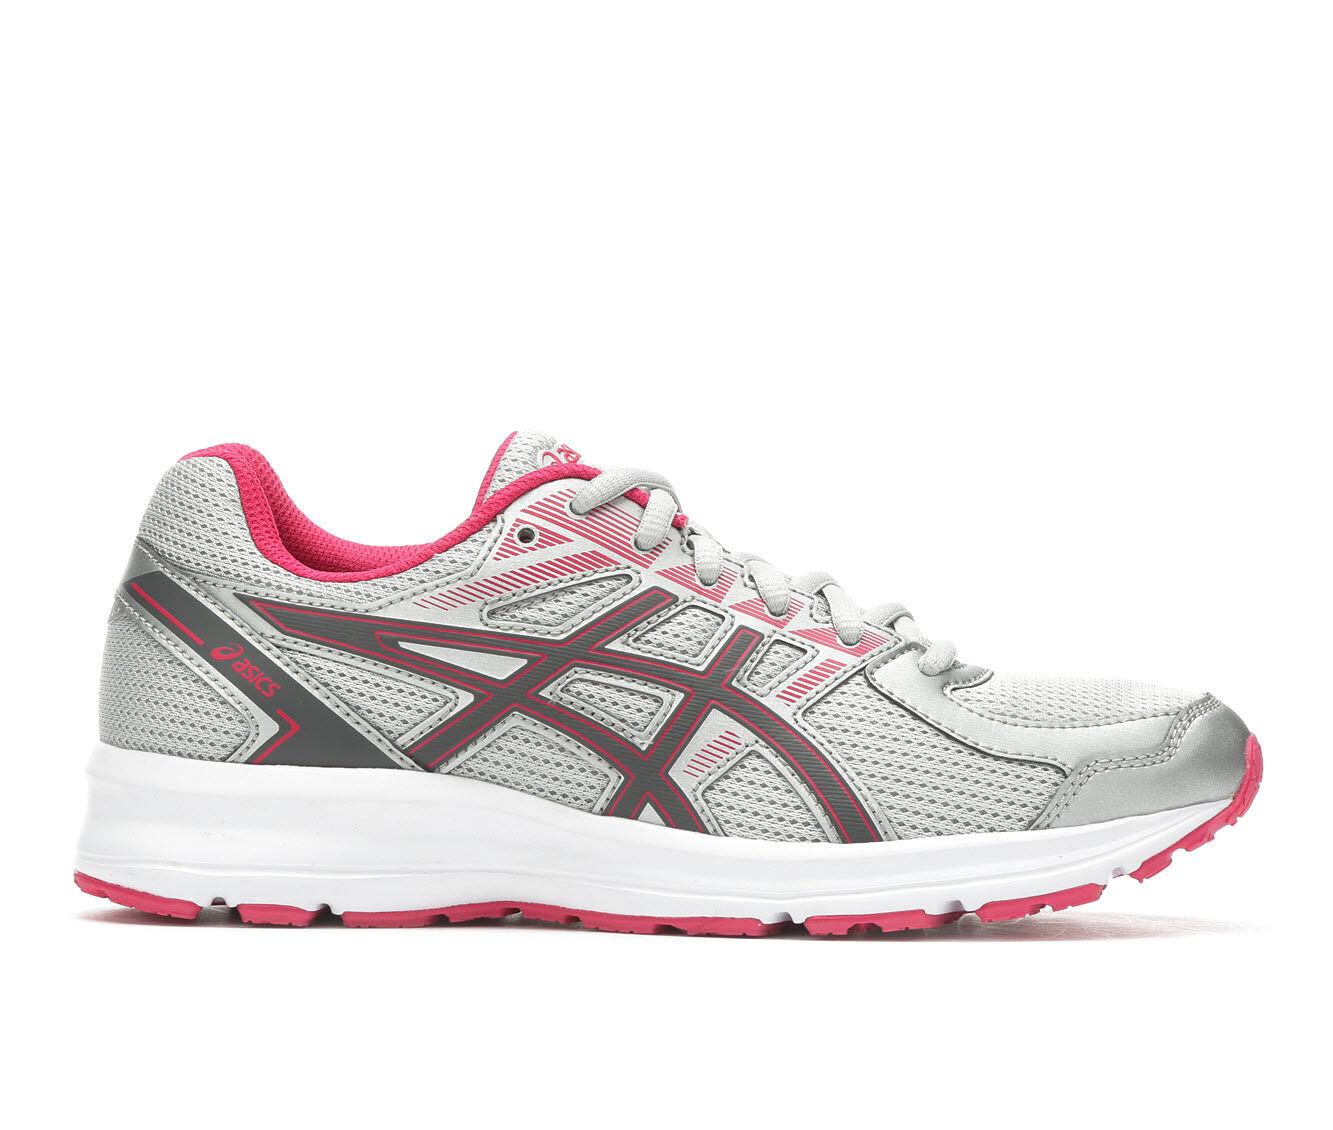 ASICS Jolt Women's Running ... Shoes buy cheap newest mEQIi